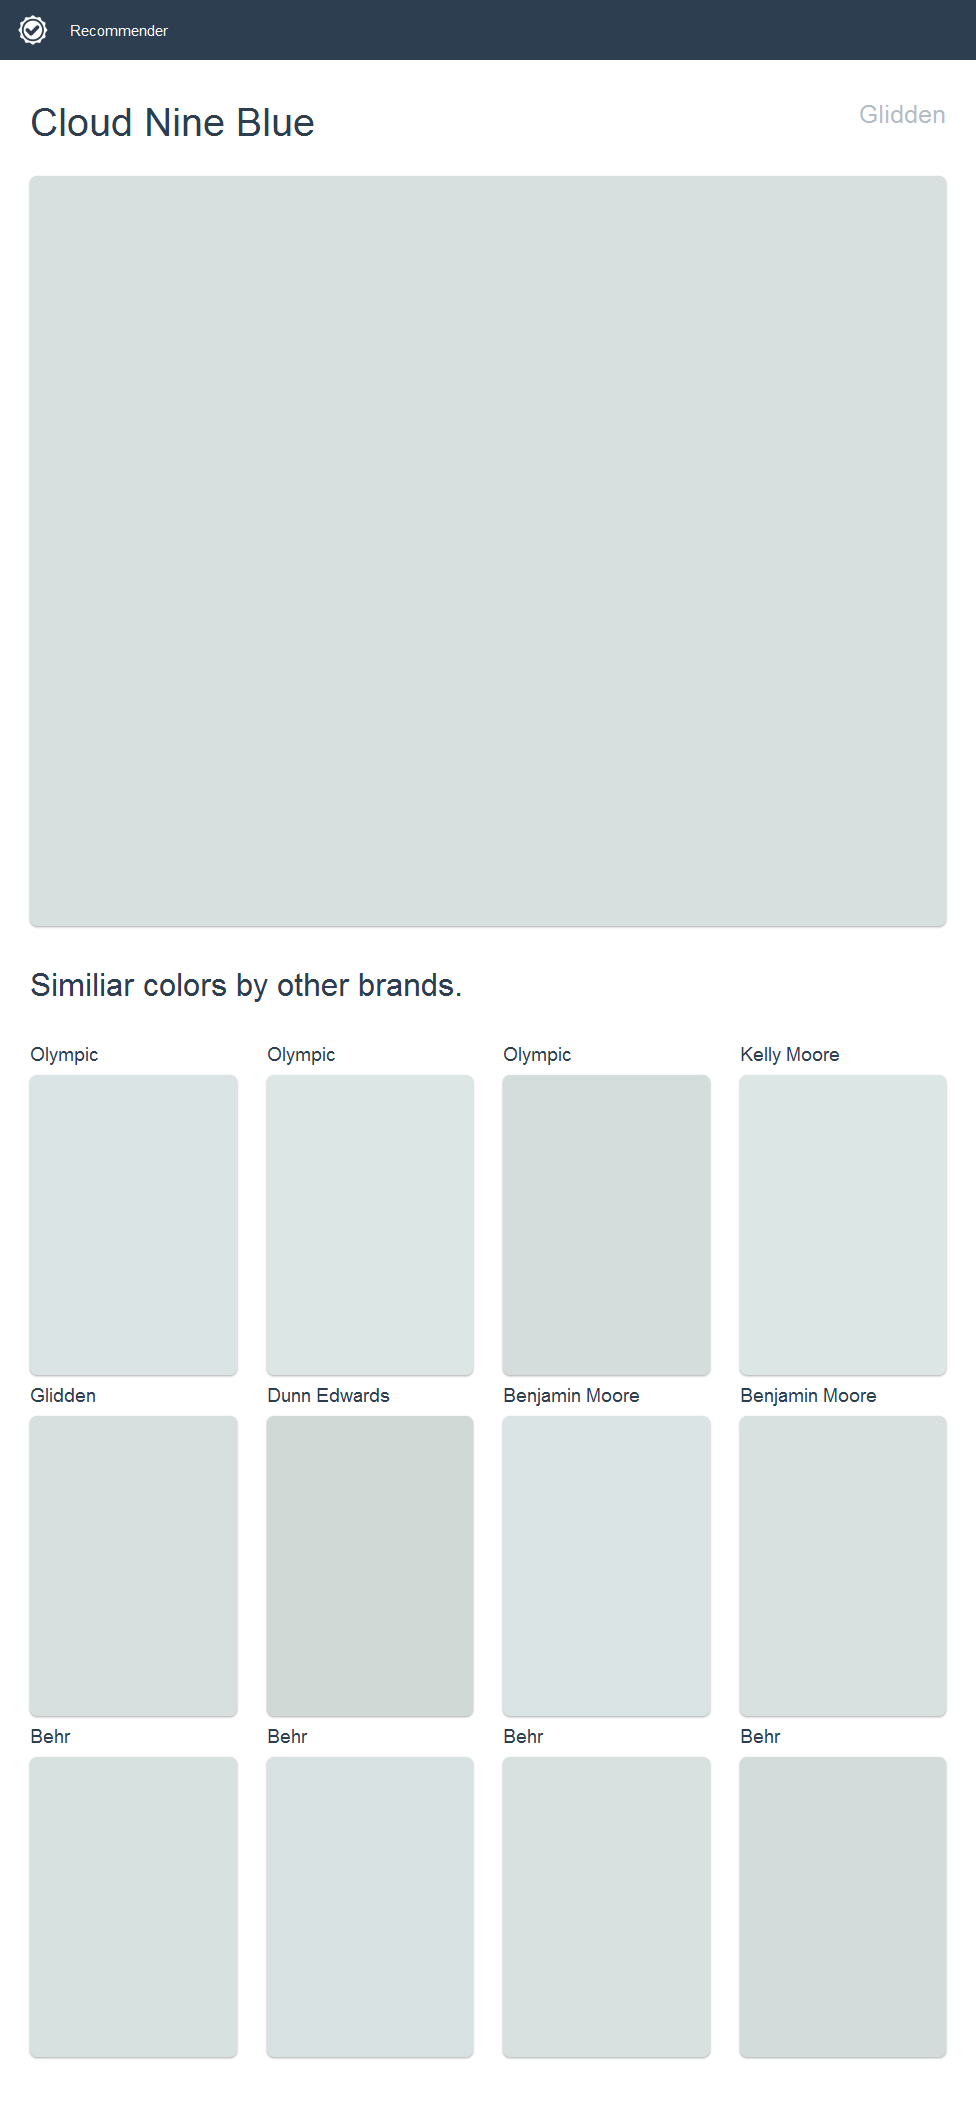 cloud nine blue  glidden click the image to see similiar valspar bathroom paint drying time valspar bedroom paint ideas